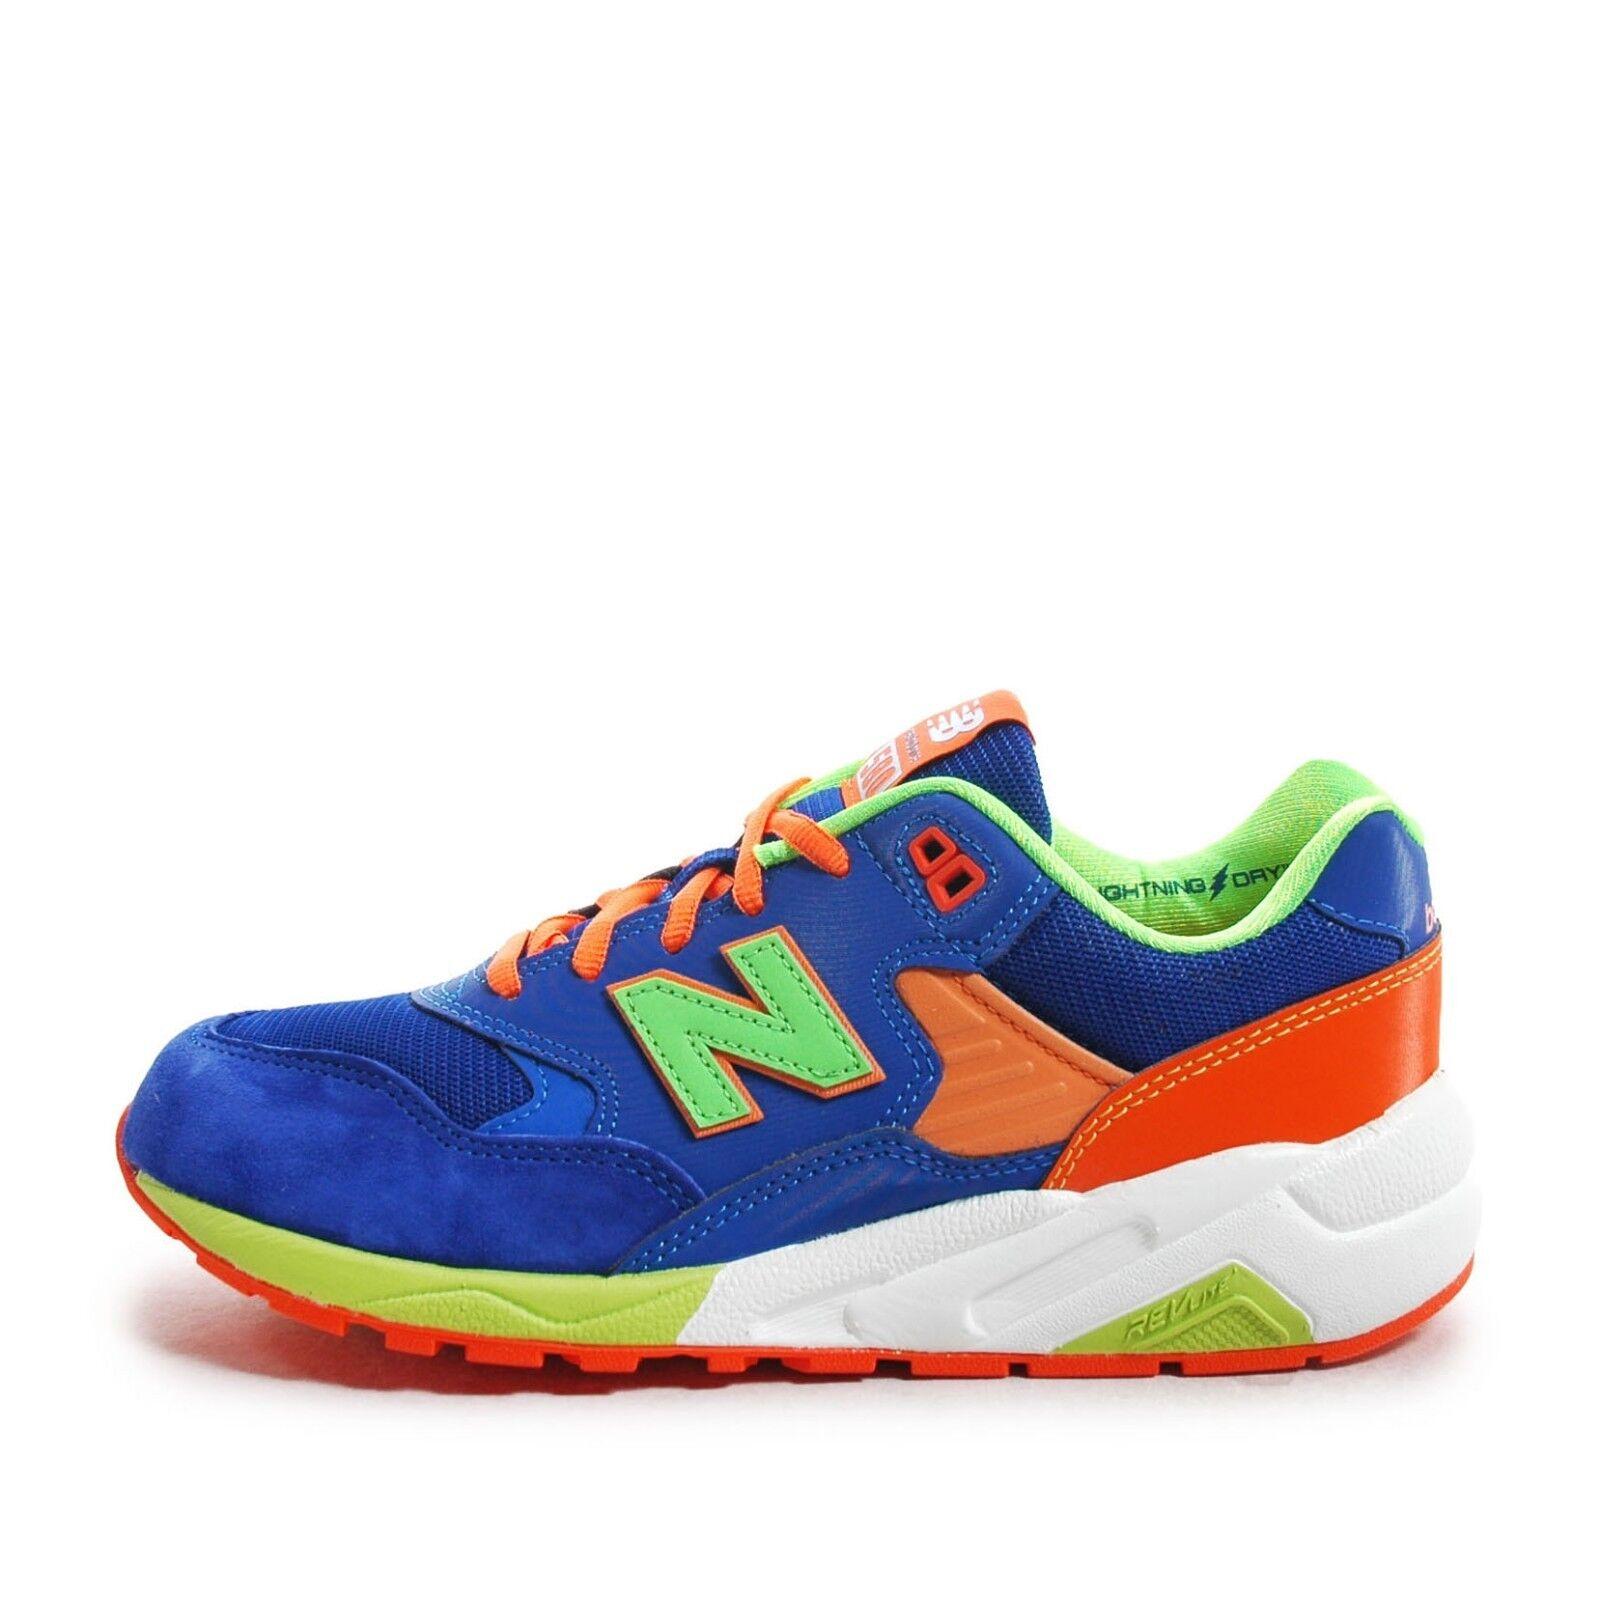 New Balance Casual MRT580BM D [MRT580BM] Men Casual Balance Shoes Cobalt Blue/Orange US 9.5 93c530